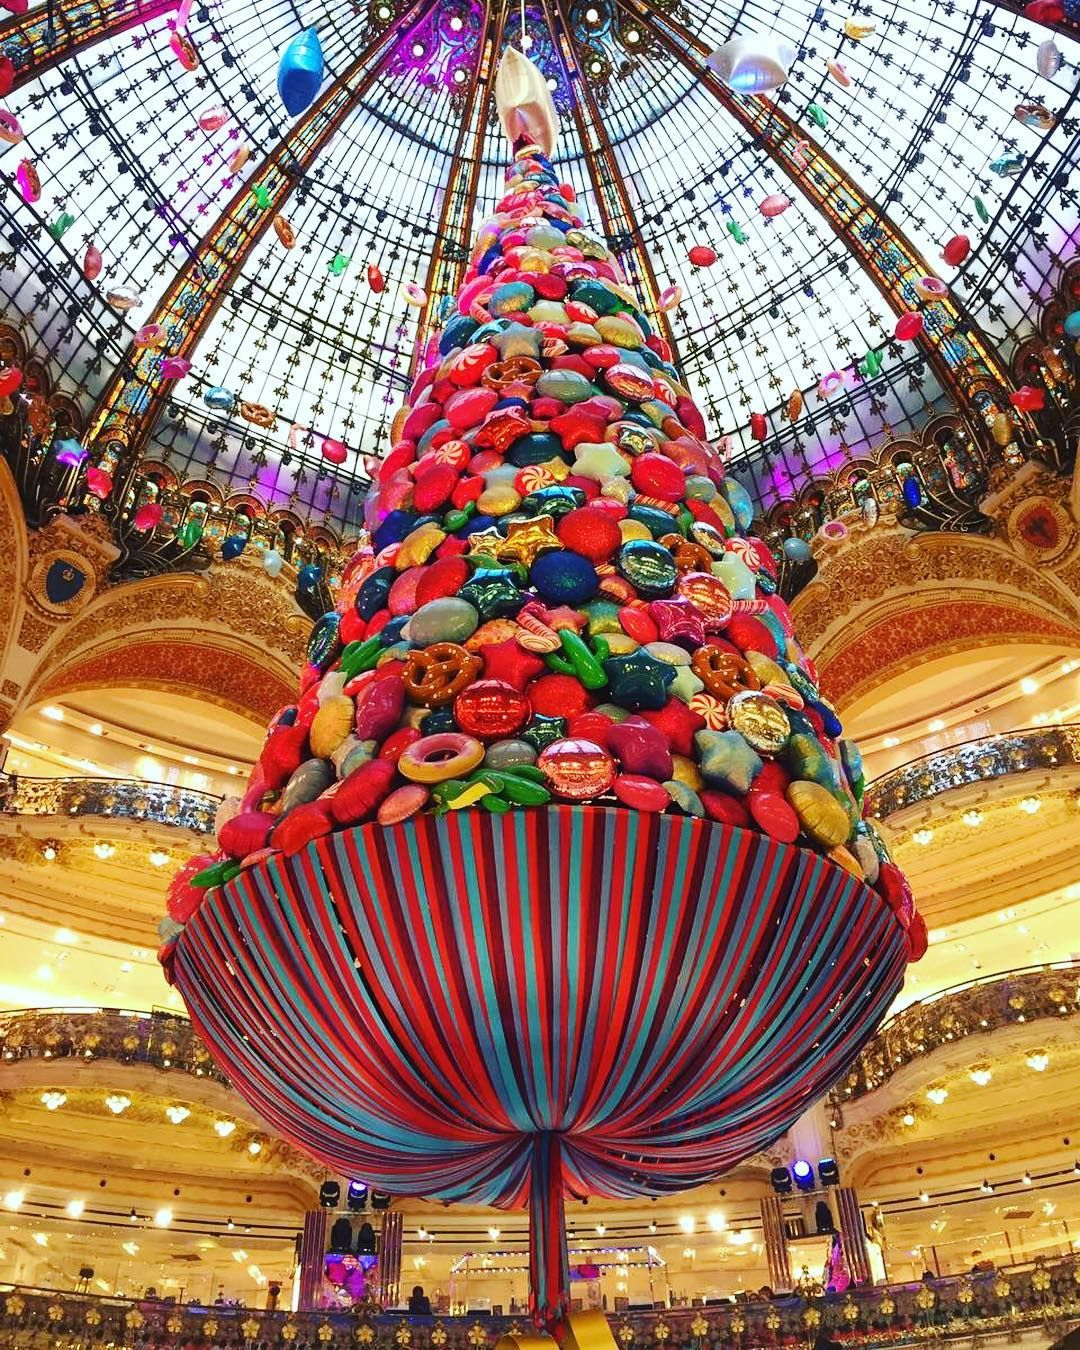 A Arvore De Natal Das Galerias Lafayette Em Paris Um Charme Lampeberger Lampebergerbr Lamparina Aromatizadordeambiente Natal Em 2020 Lamparina Galerias Paris